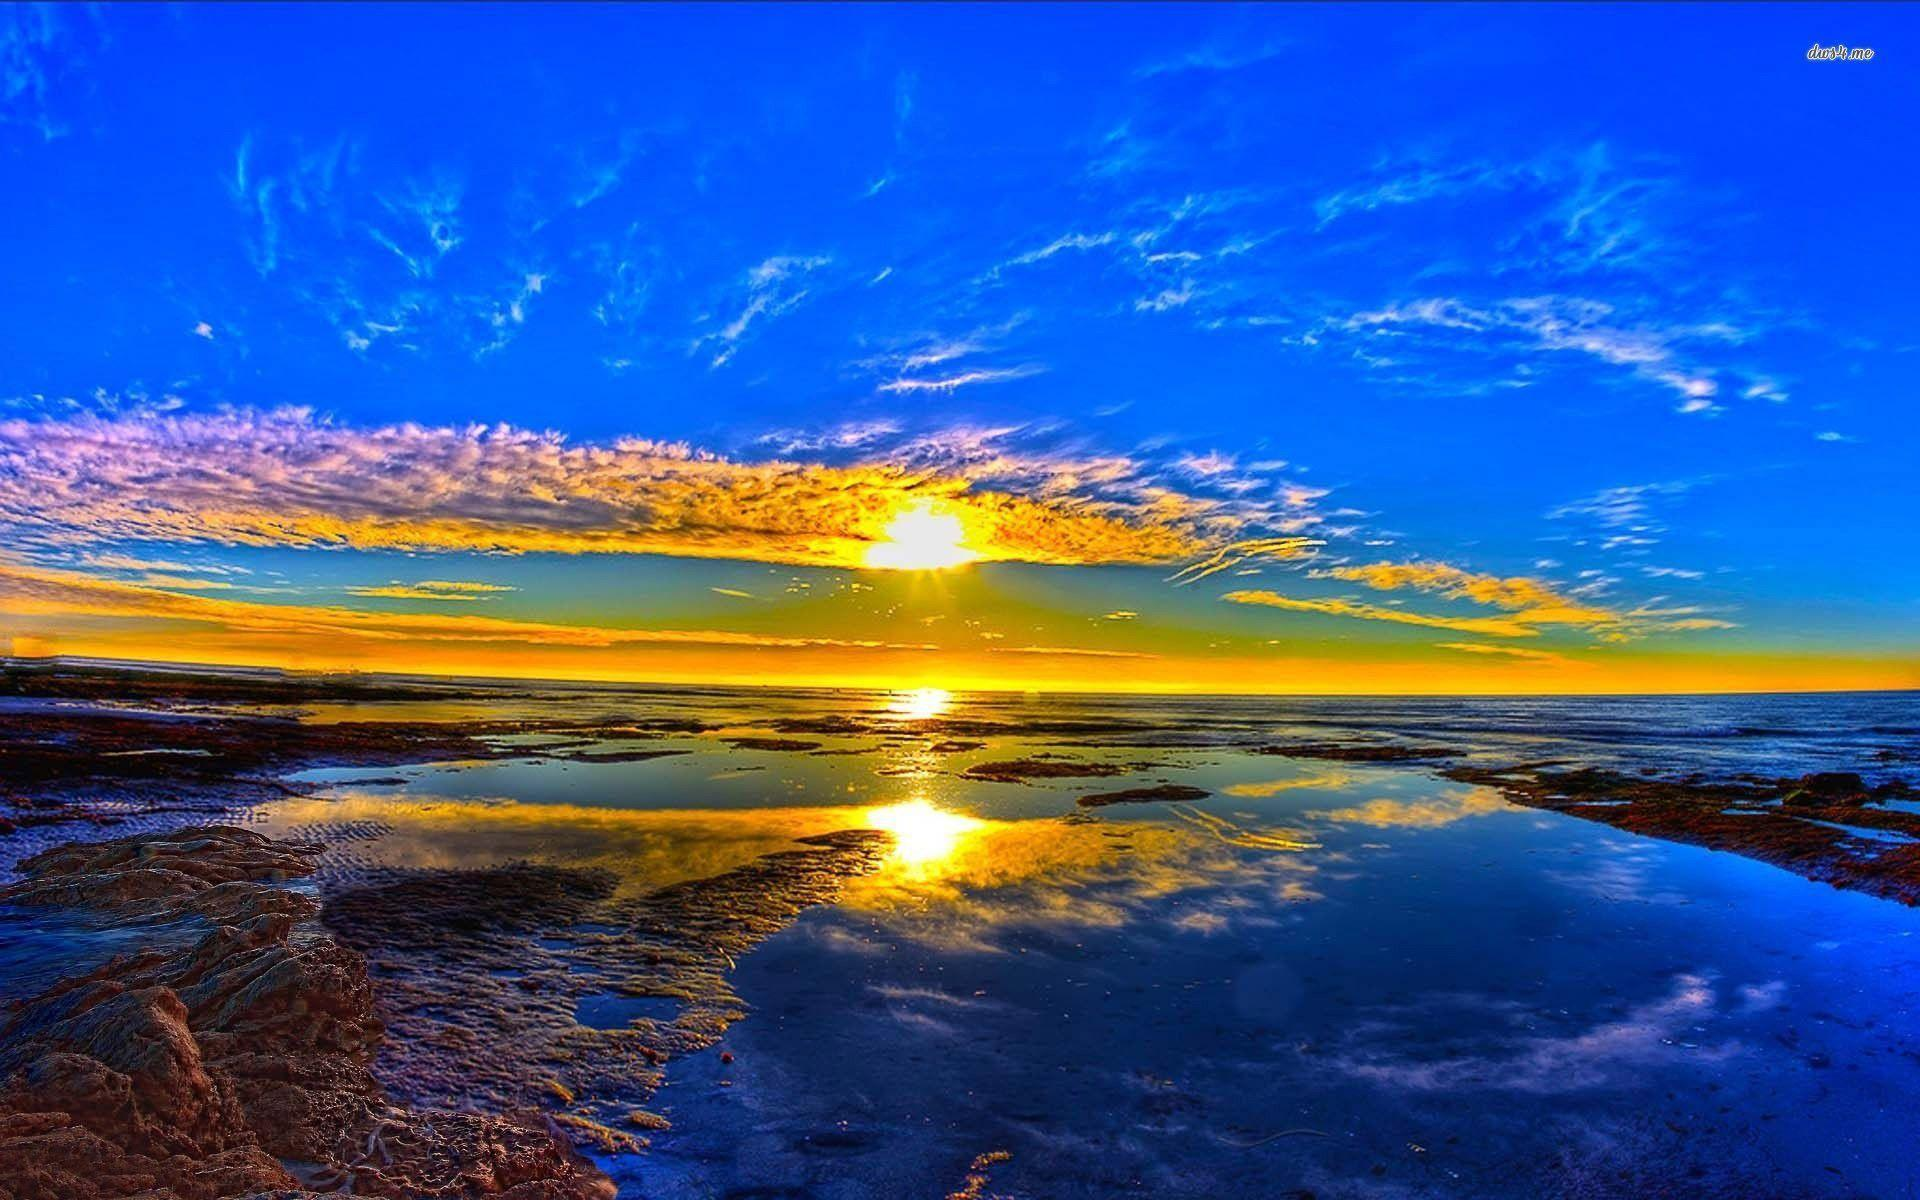 Sun Rise wallpaper - 1182652